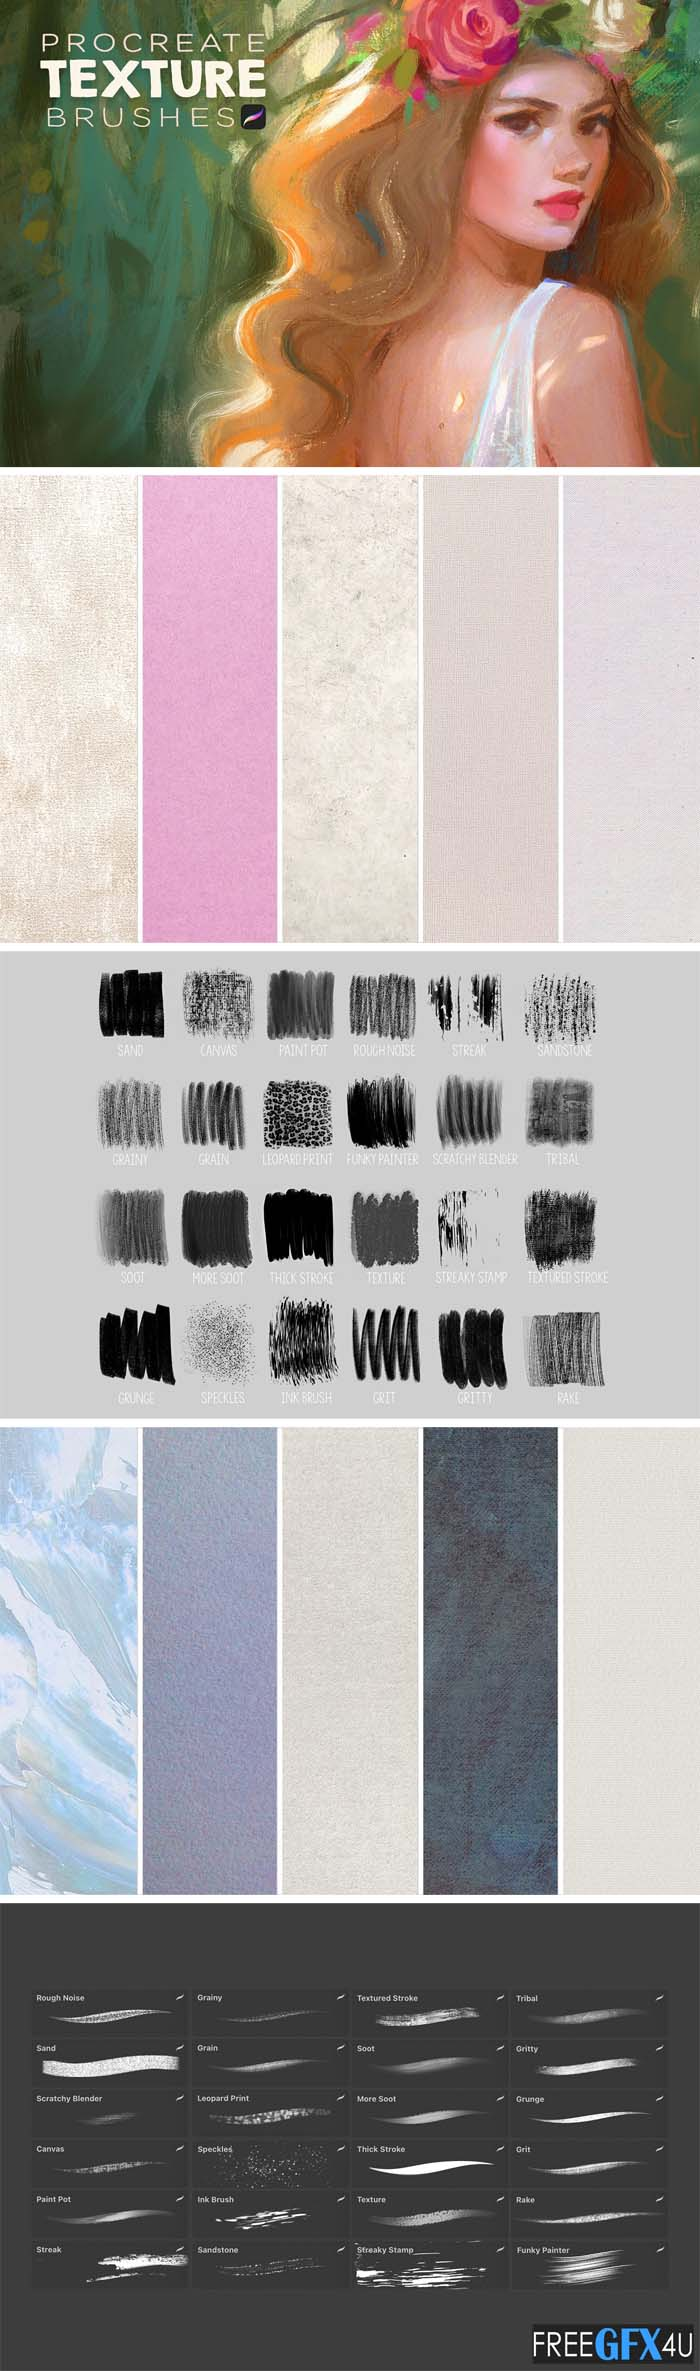 Procreate Texture Brush Set